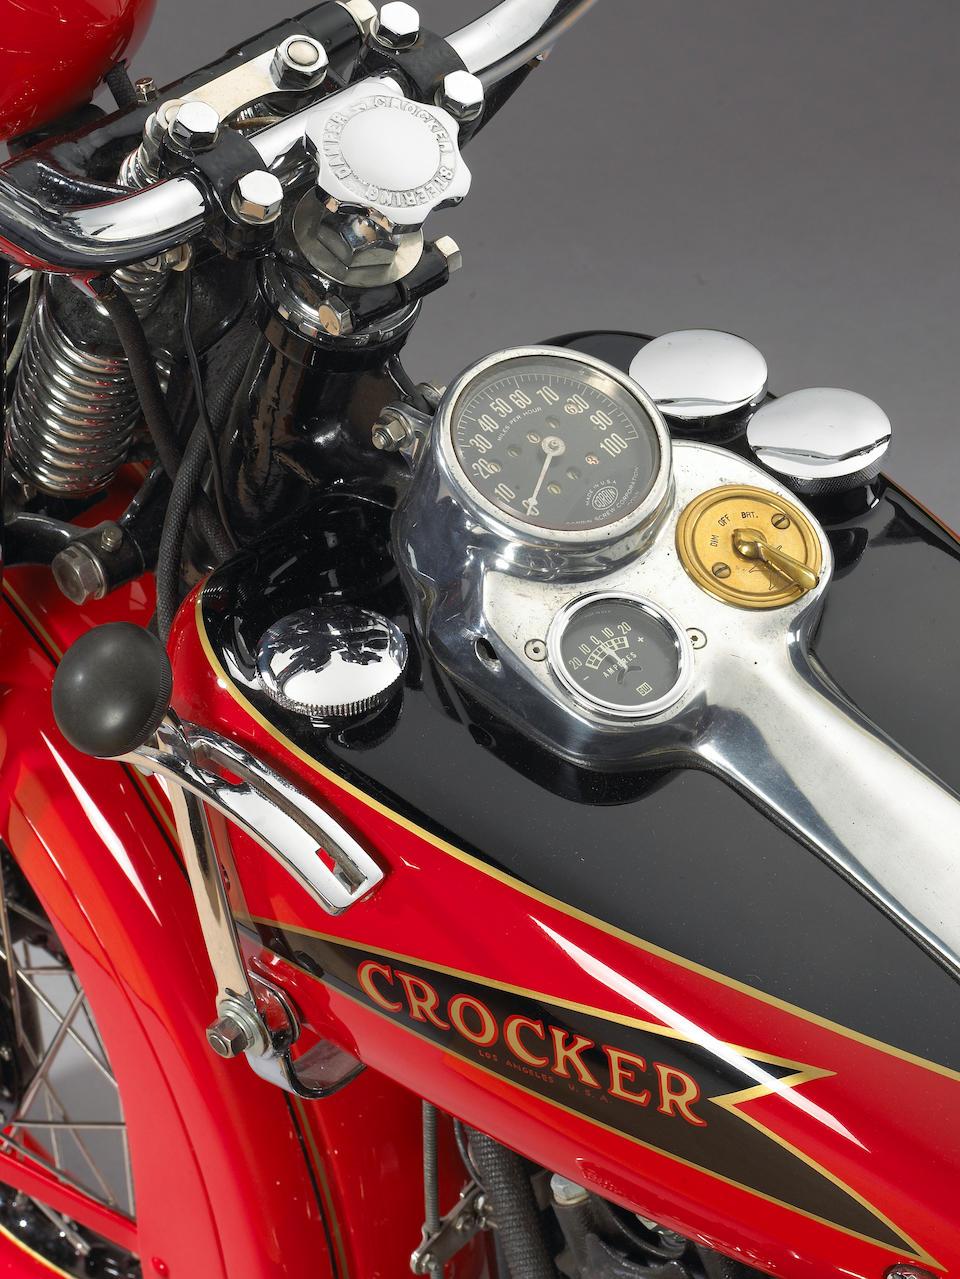 From Silverman Museum Racing,1937 Crocker 'Hemi-Head' V-Twin Motorcycle Engine no. 376119